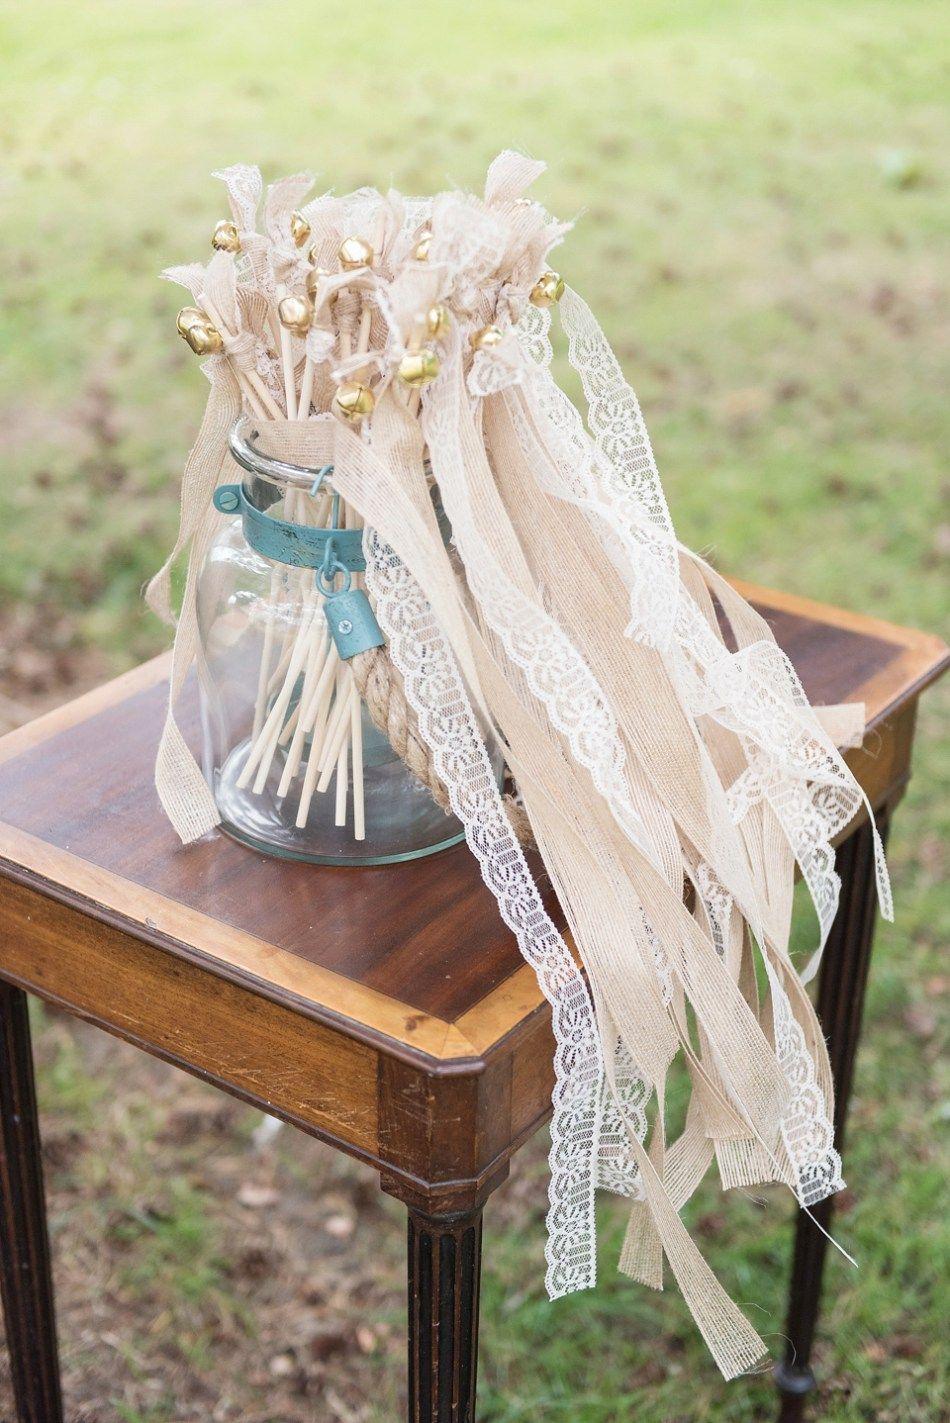 An essense of australia dress for a homespun and outdoor country